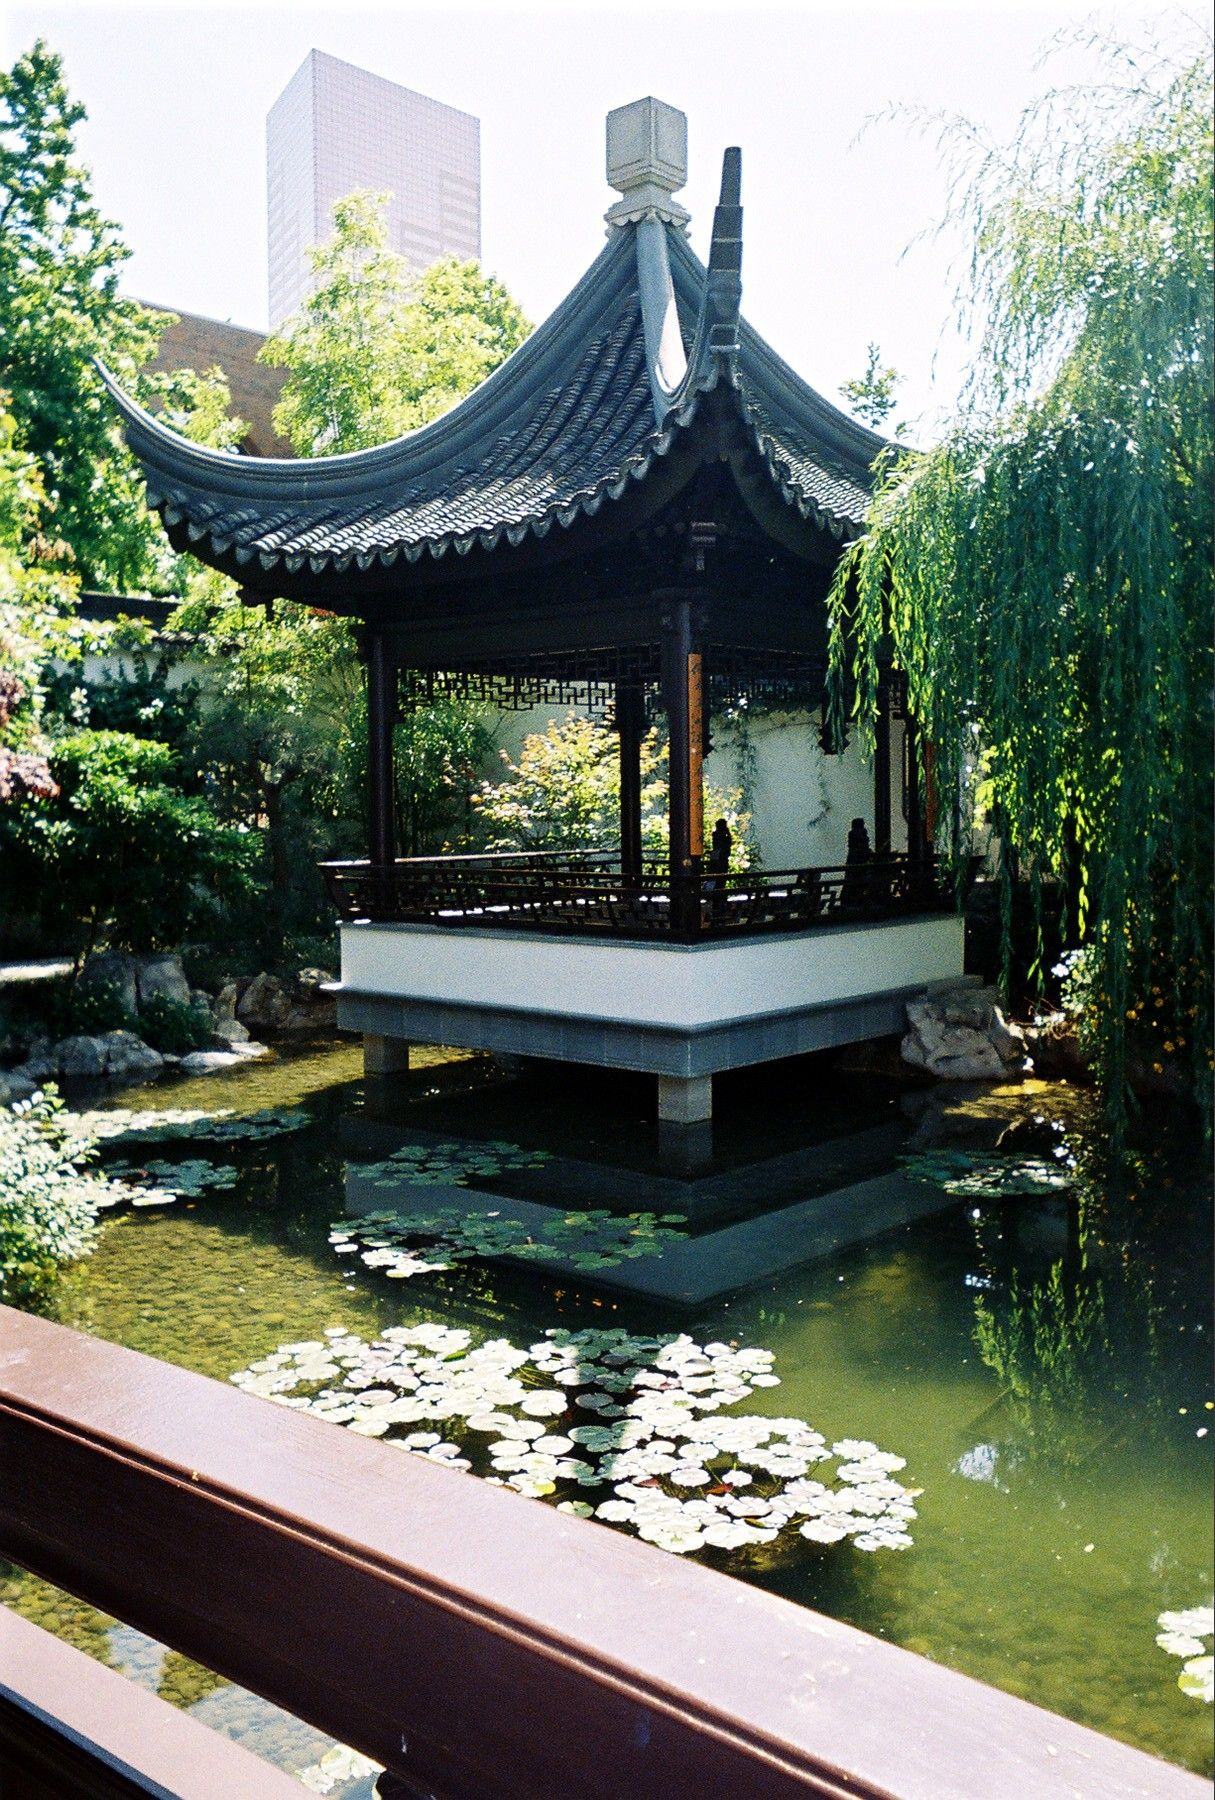 Pagoda and Skyscraper, Portland's Lan Su Chinese Garden